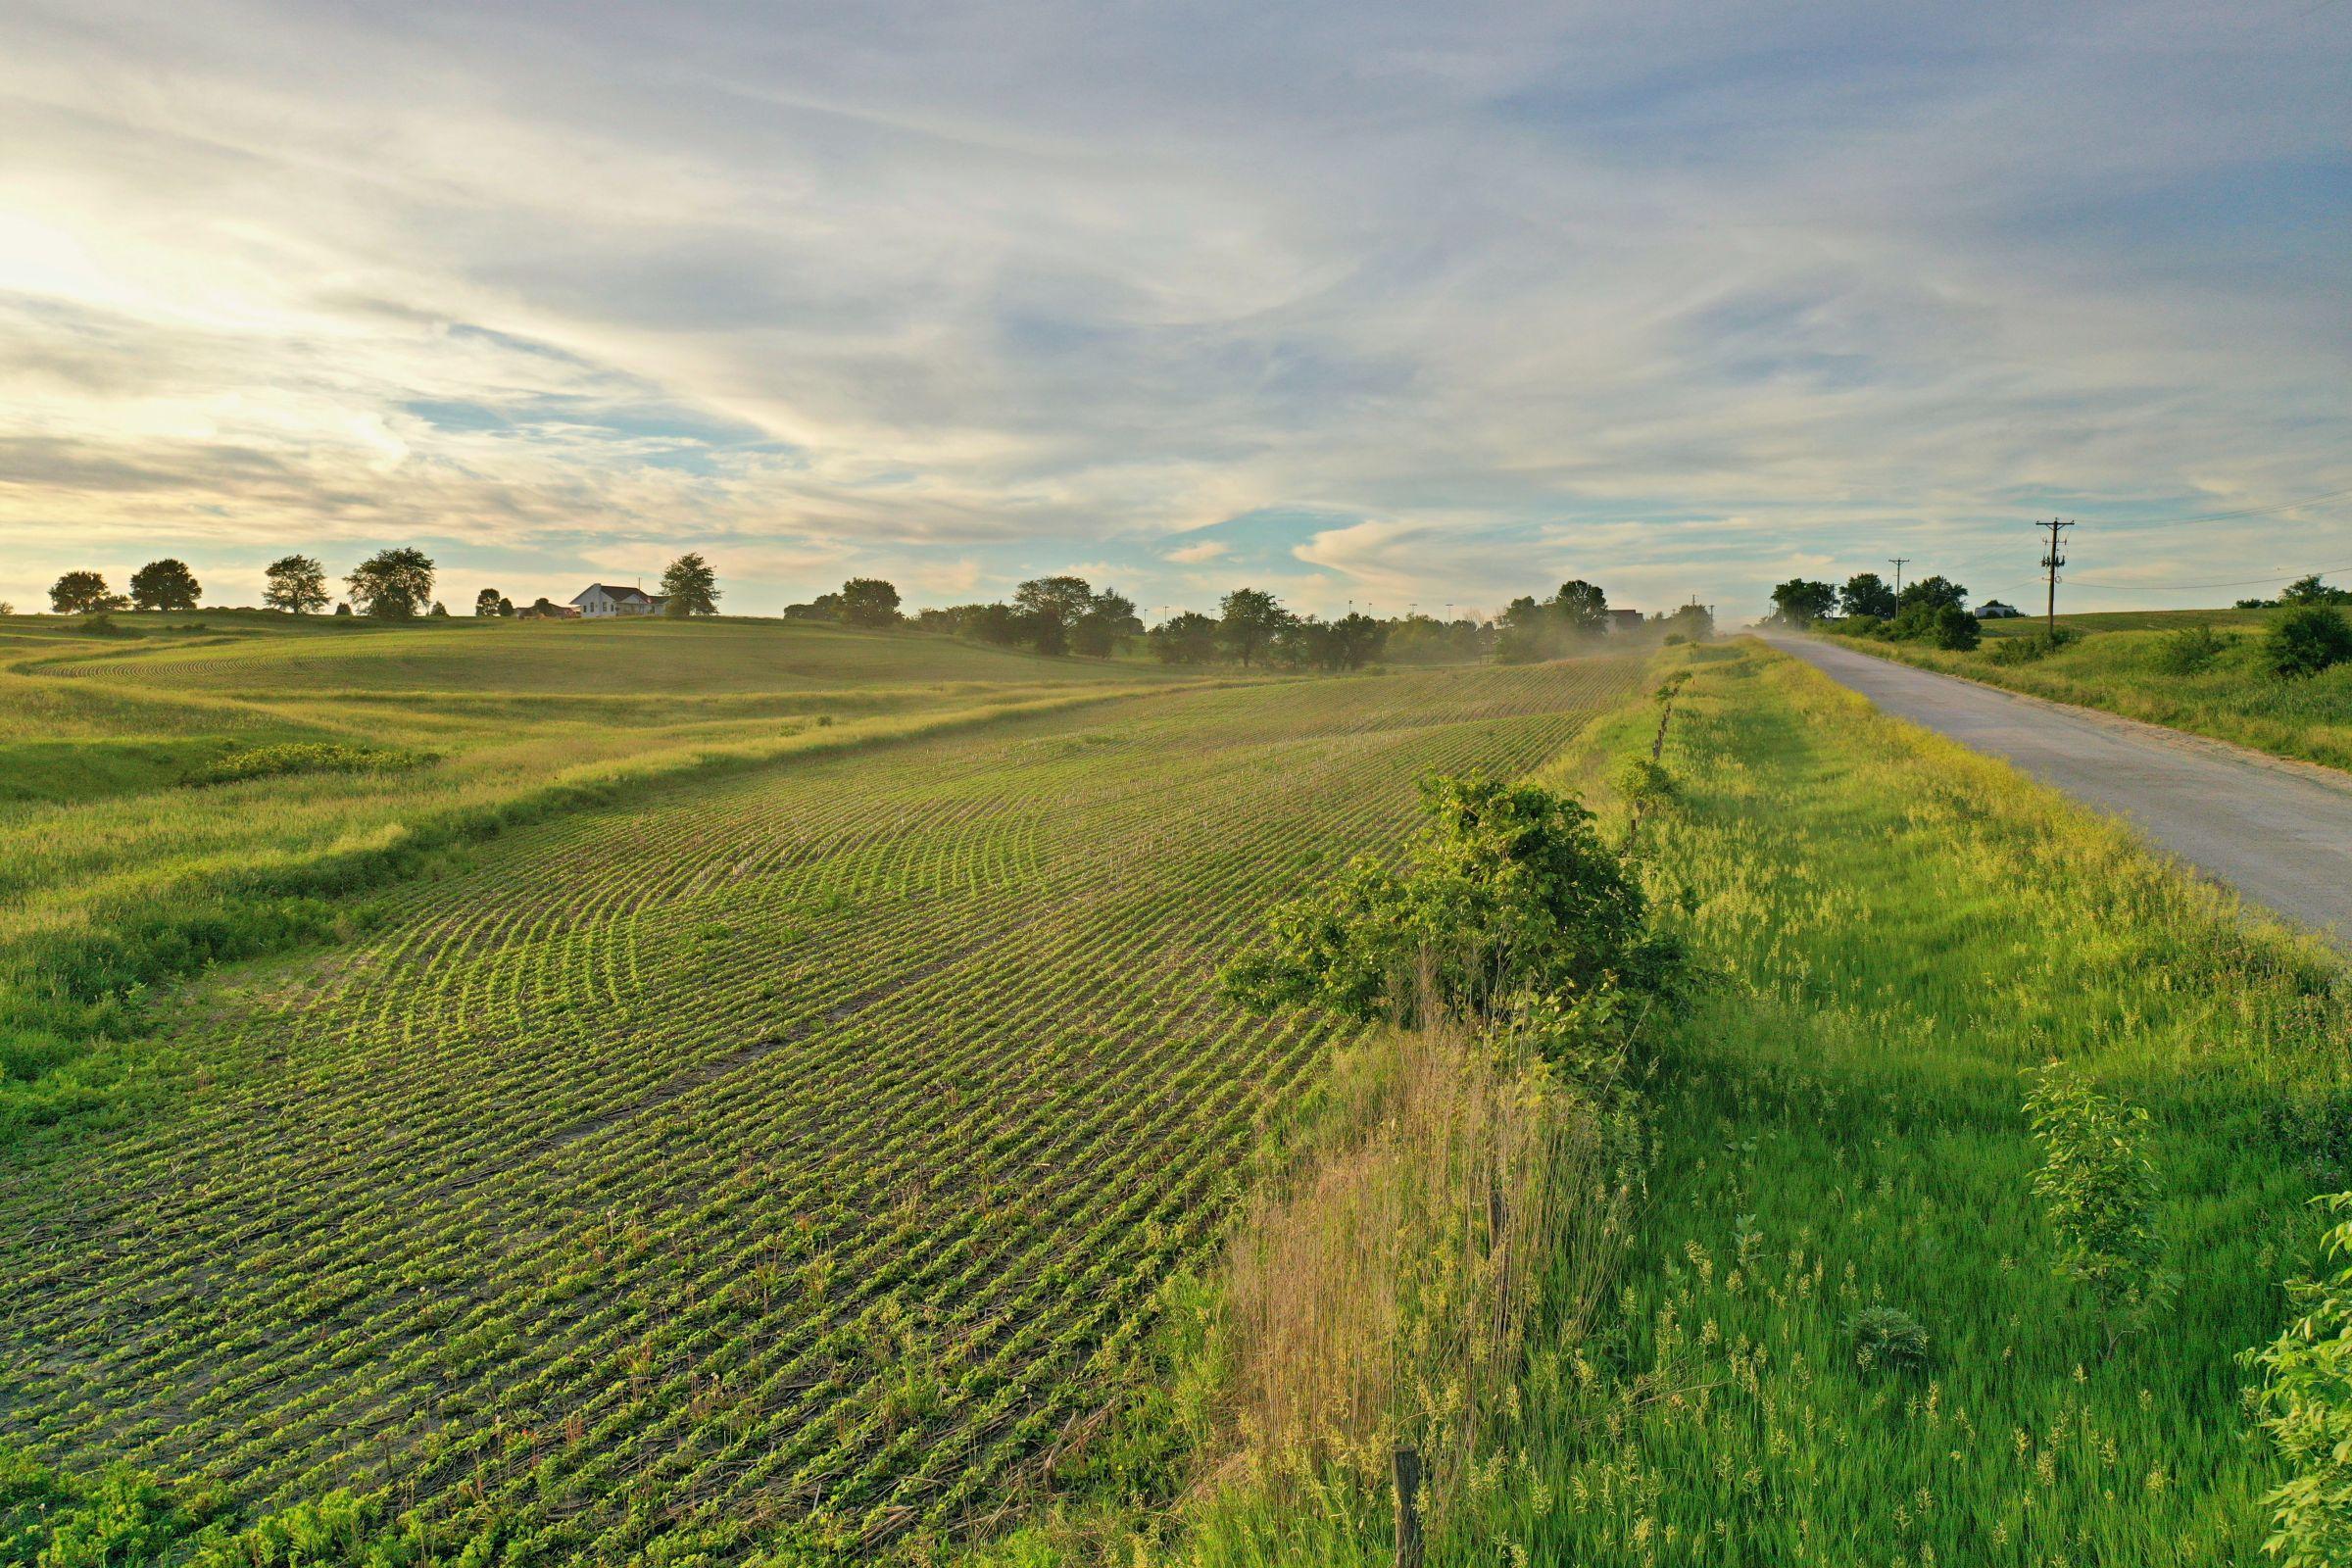 development-land-warren-county-iowa-20-acres-listing-number-15423-0-2021-03-25-202922.JPG